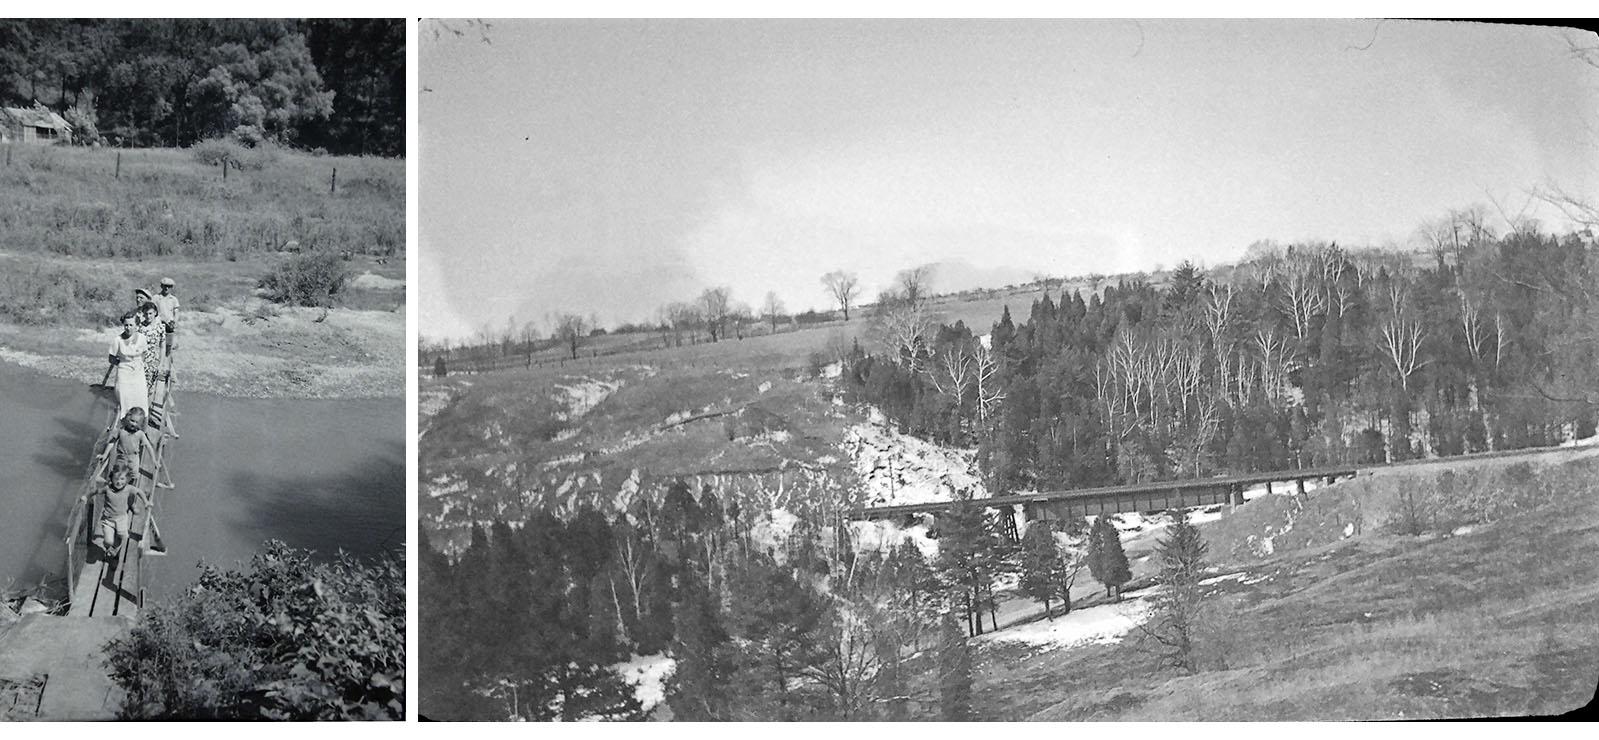 archival photographs of bridges across the Don River